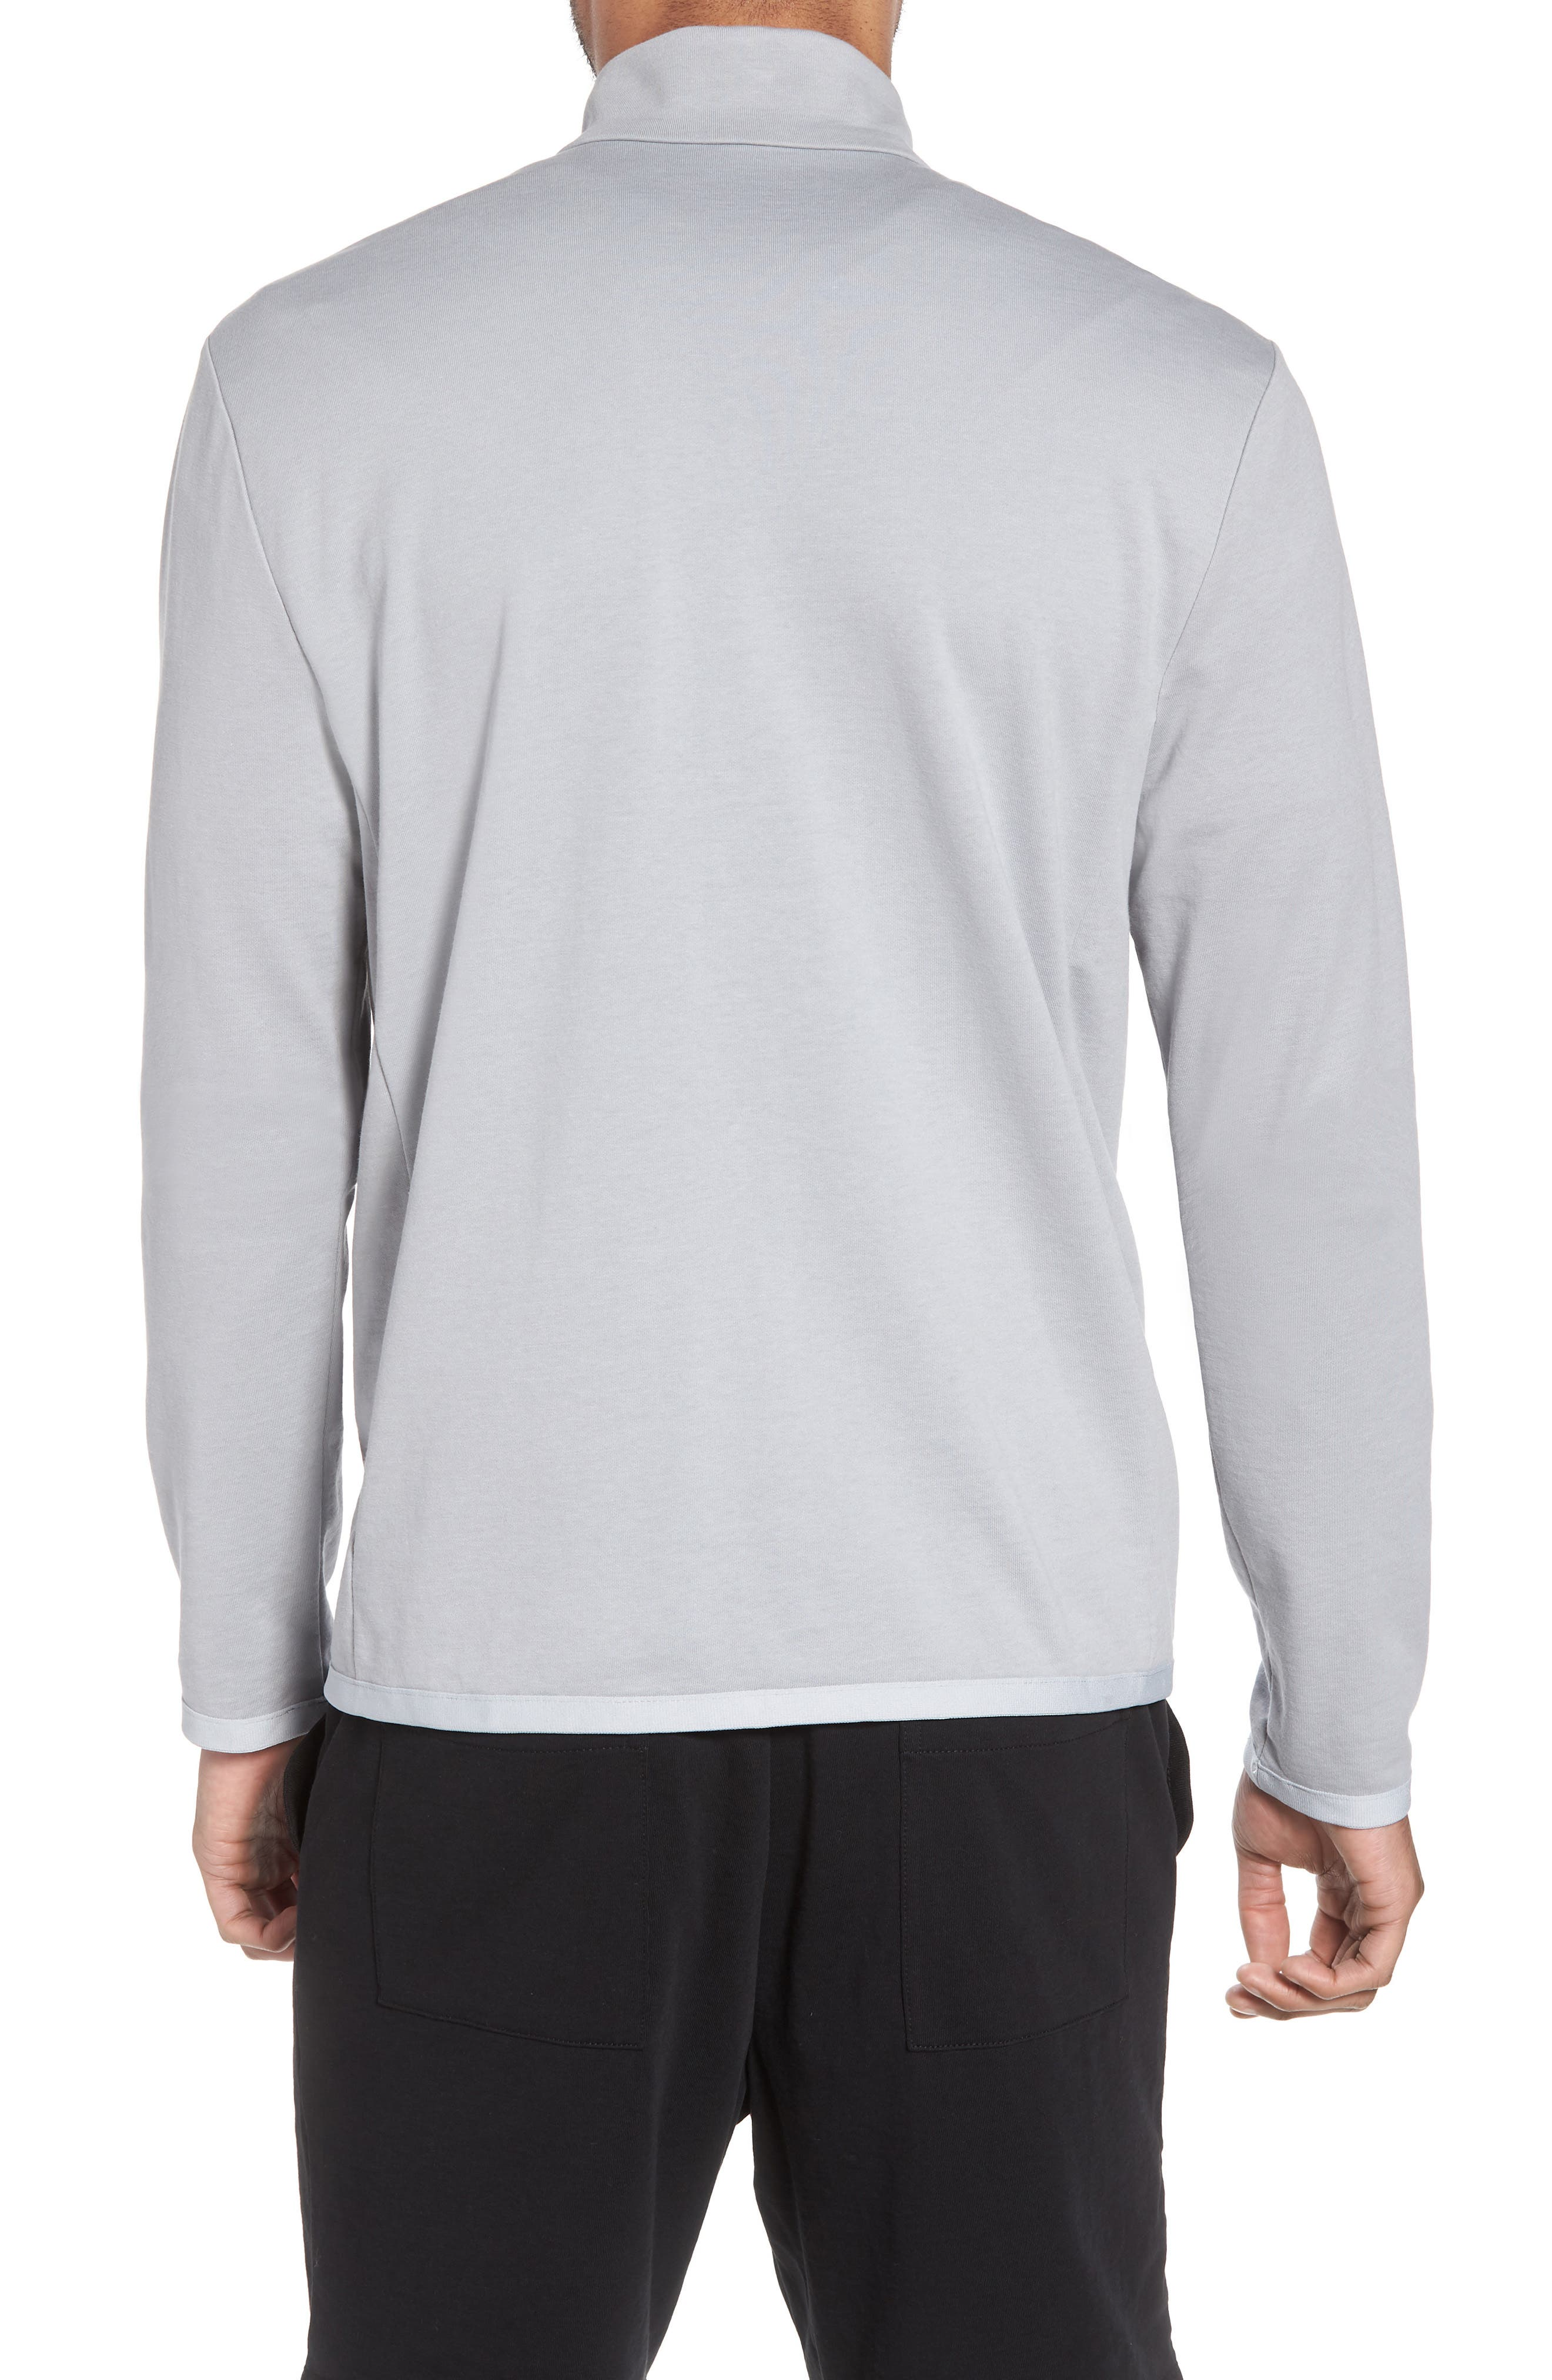 Slim Fit Compact Terry Zip Jacket,                             Alternate thumbnail 2, color,                             Grey Sky/ Light Grey